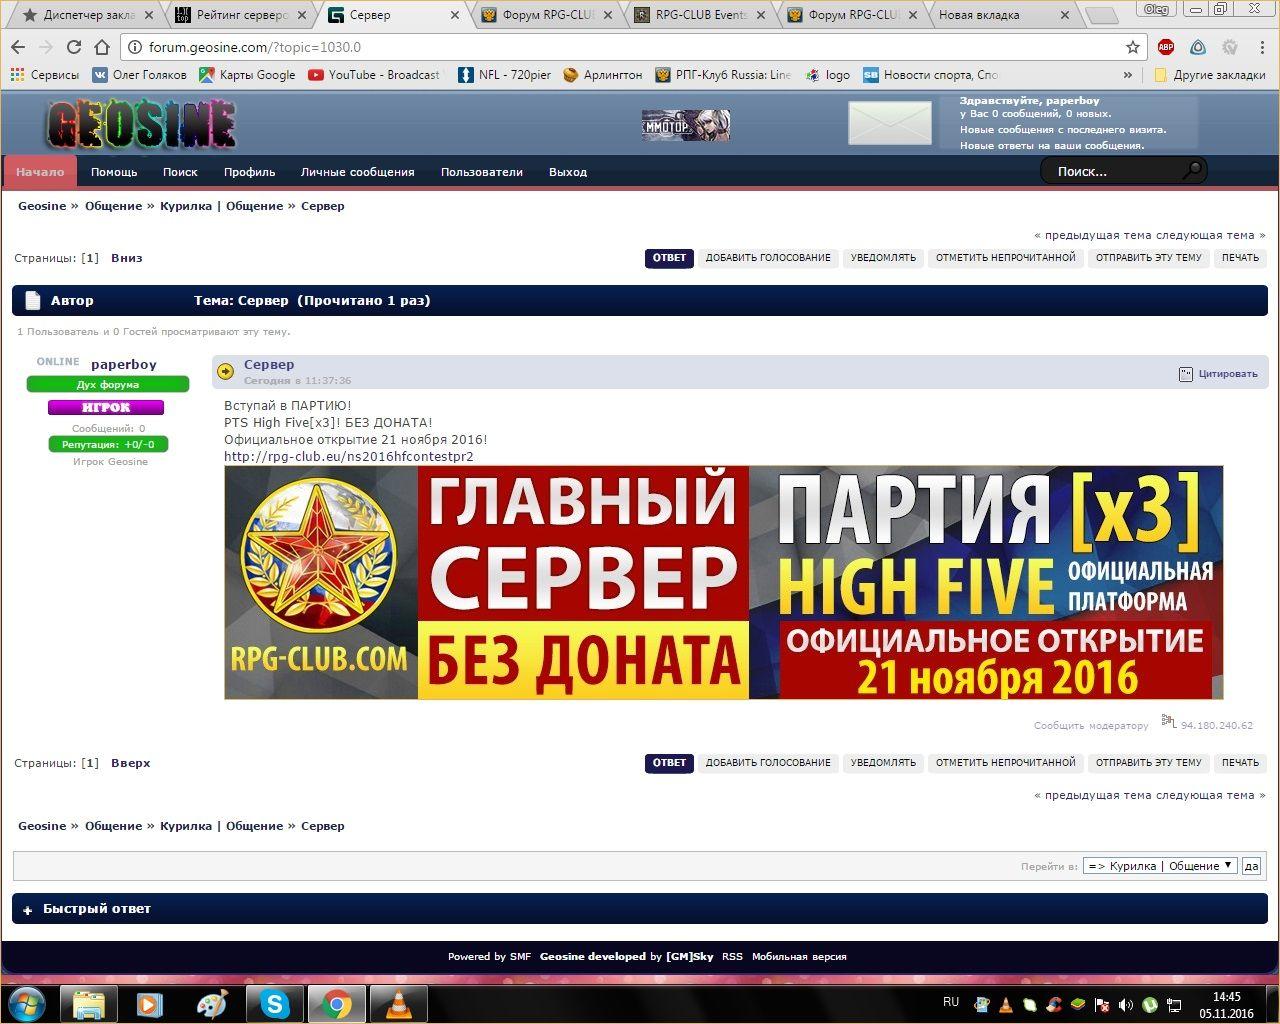 Lineage 2 Screenshot: Видео lineage 2 системные требования